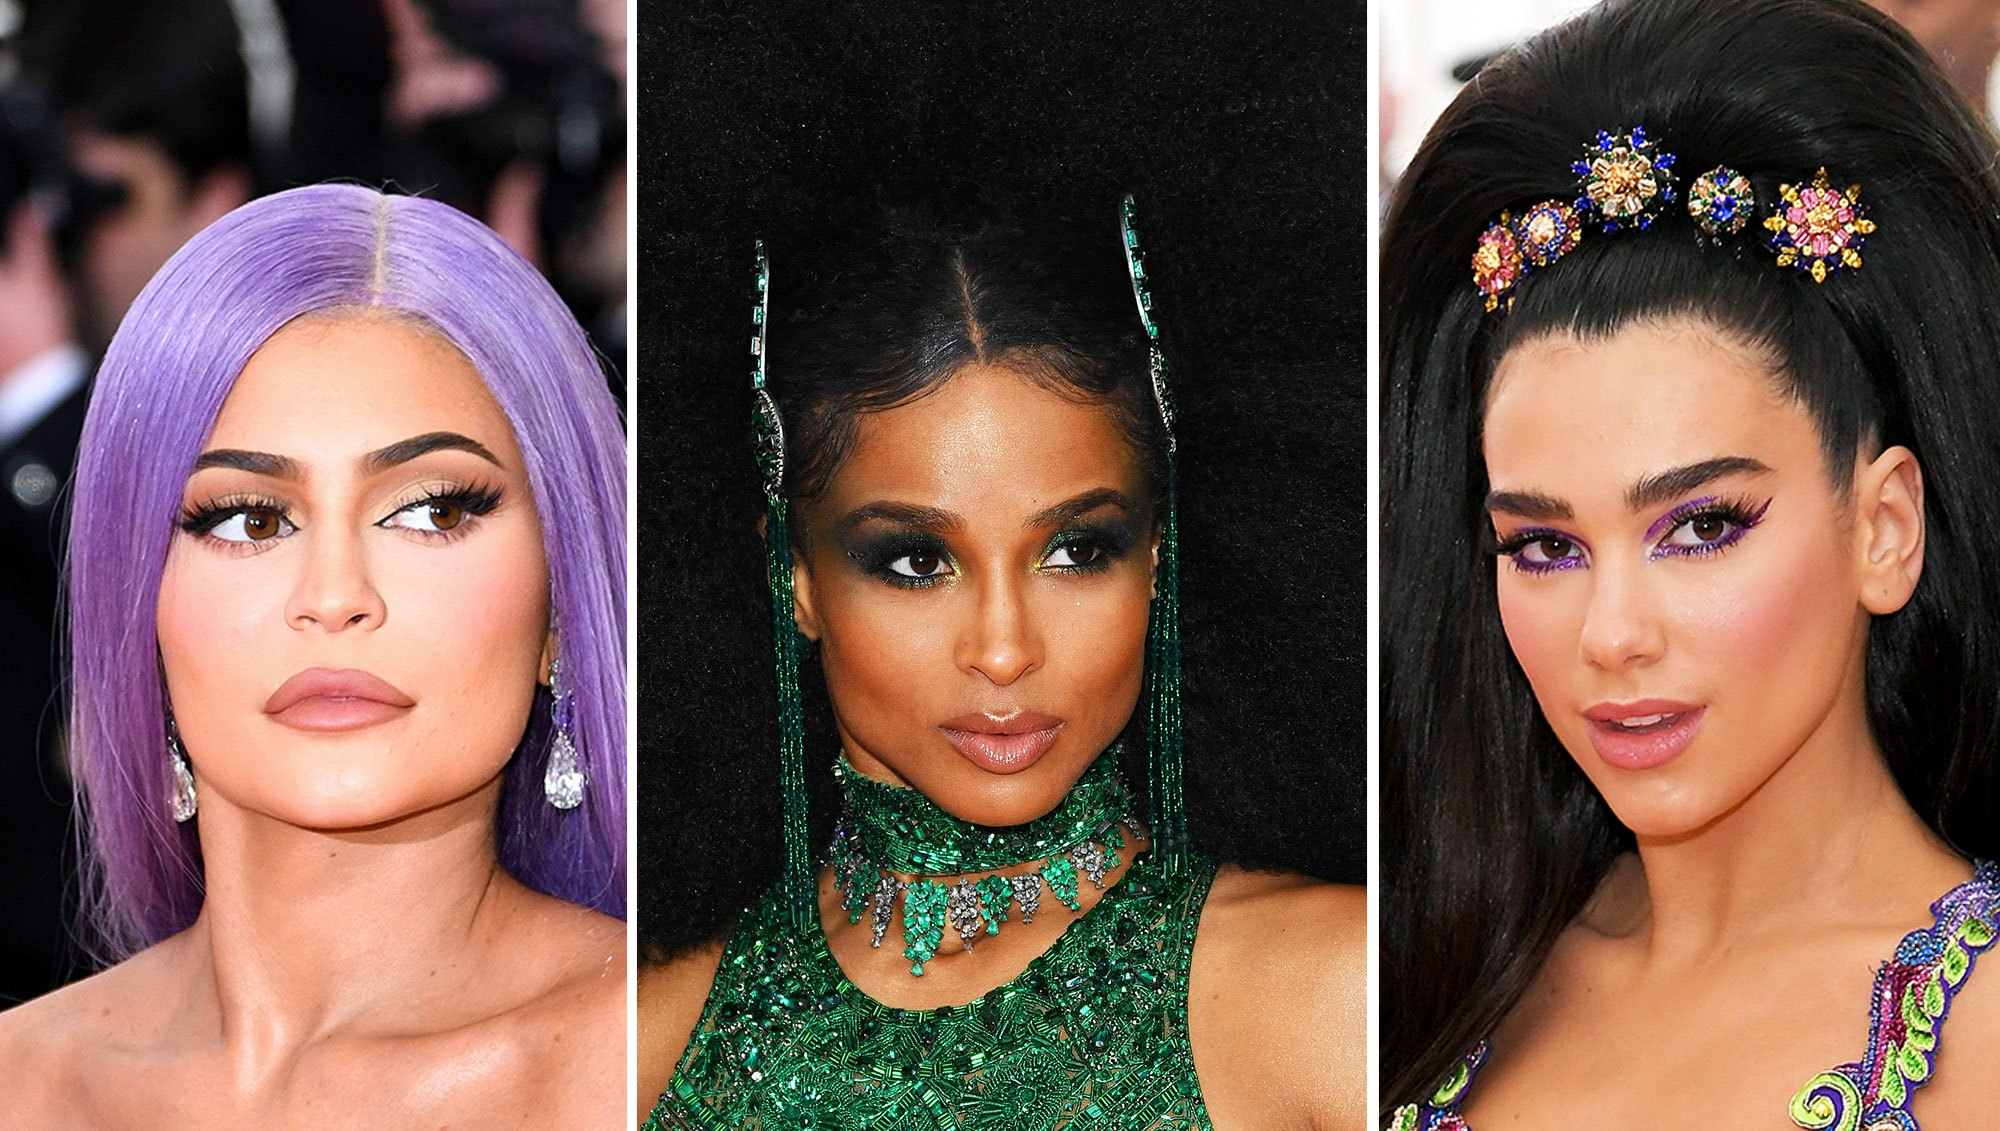 Kylie Jenner, Ciara, and Dua Lipa met gala 2019 wigs